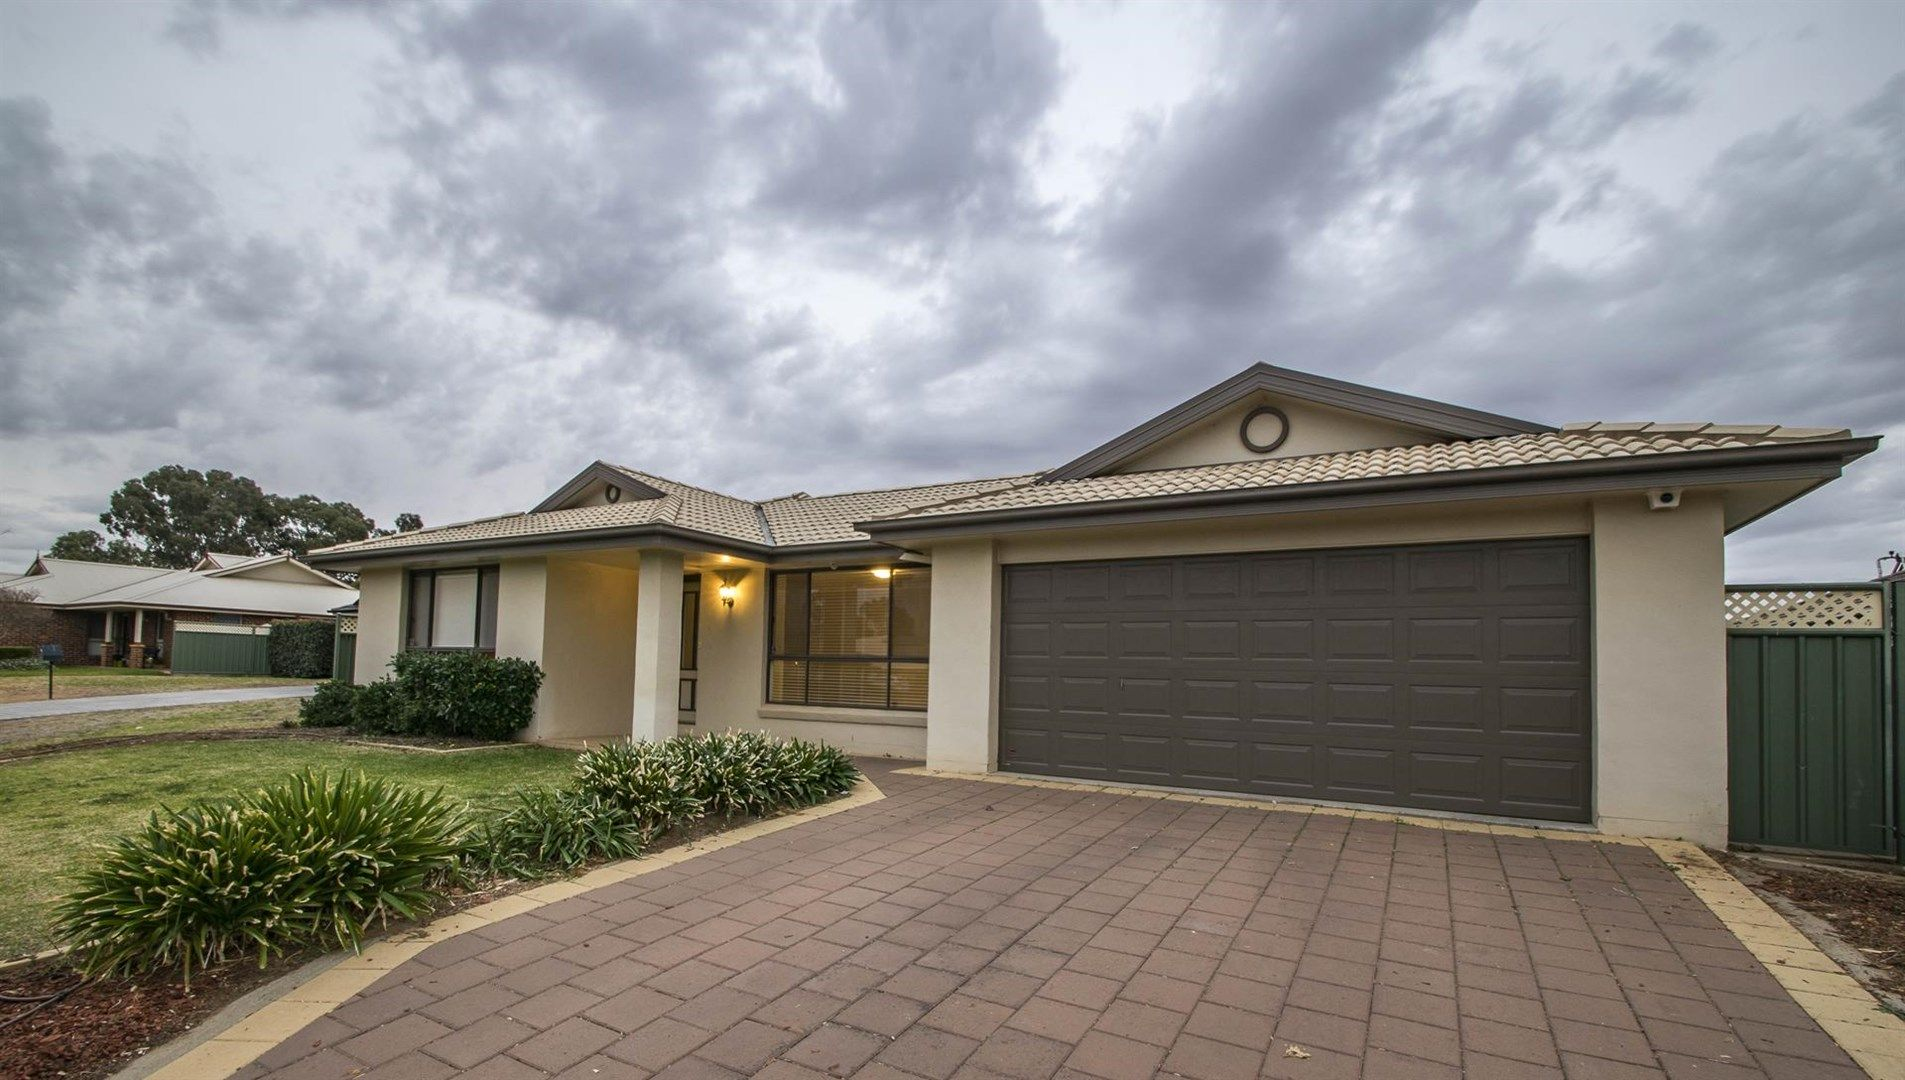 18 Ashlundie Crescent, Dubbo NSW 2830, Image 0